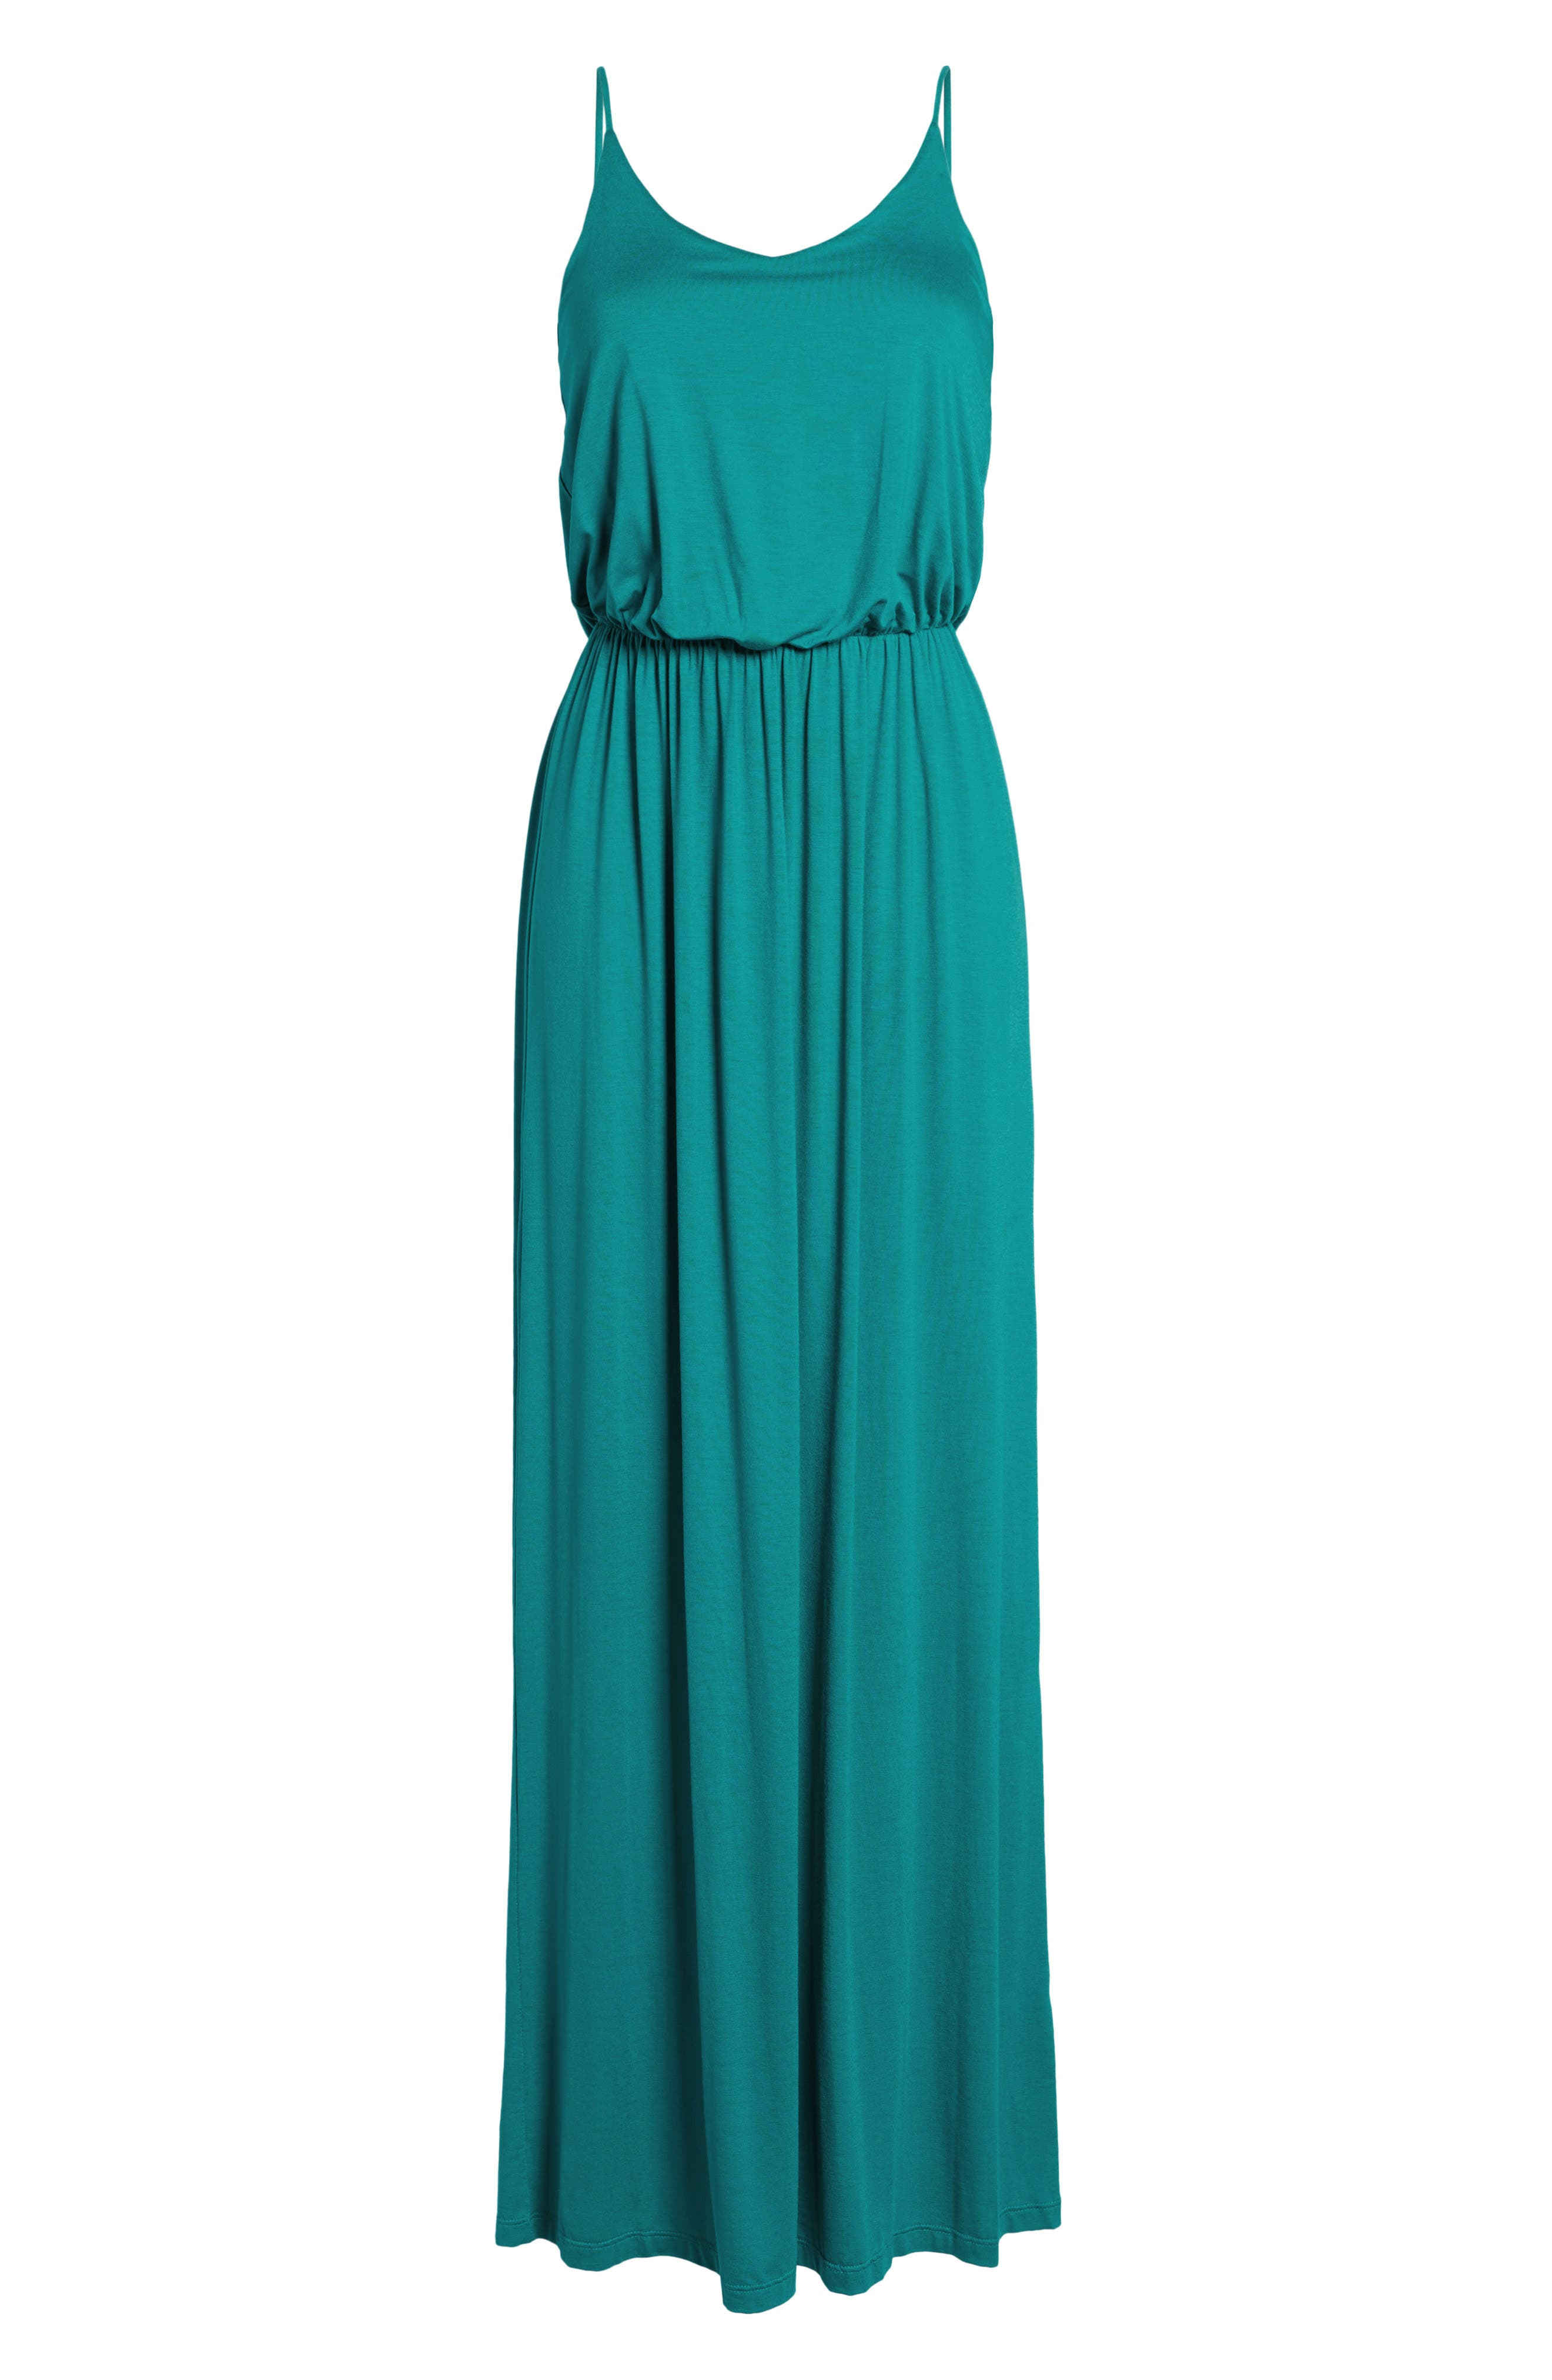 Alternate Image 1 Selected - Knit Maxi Dress